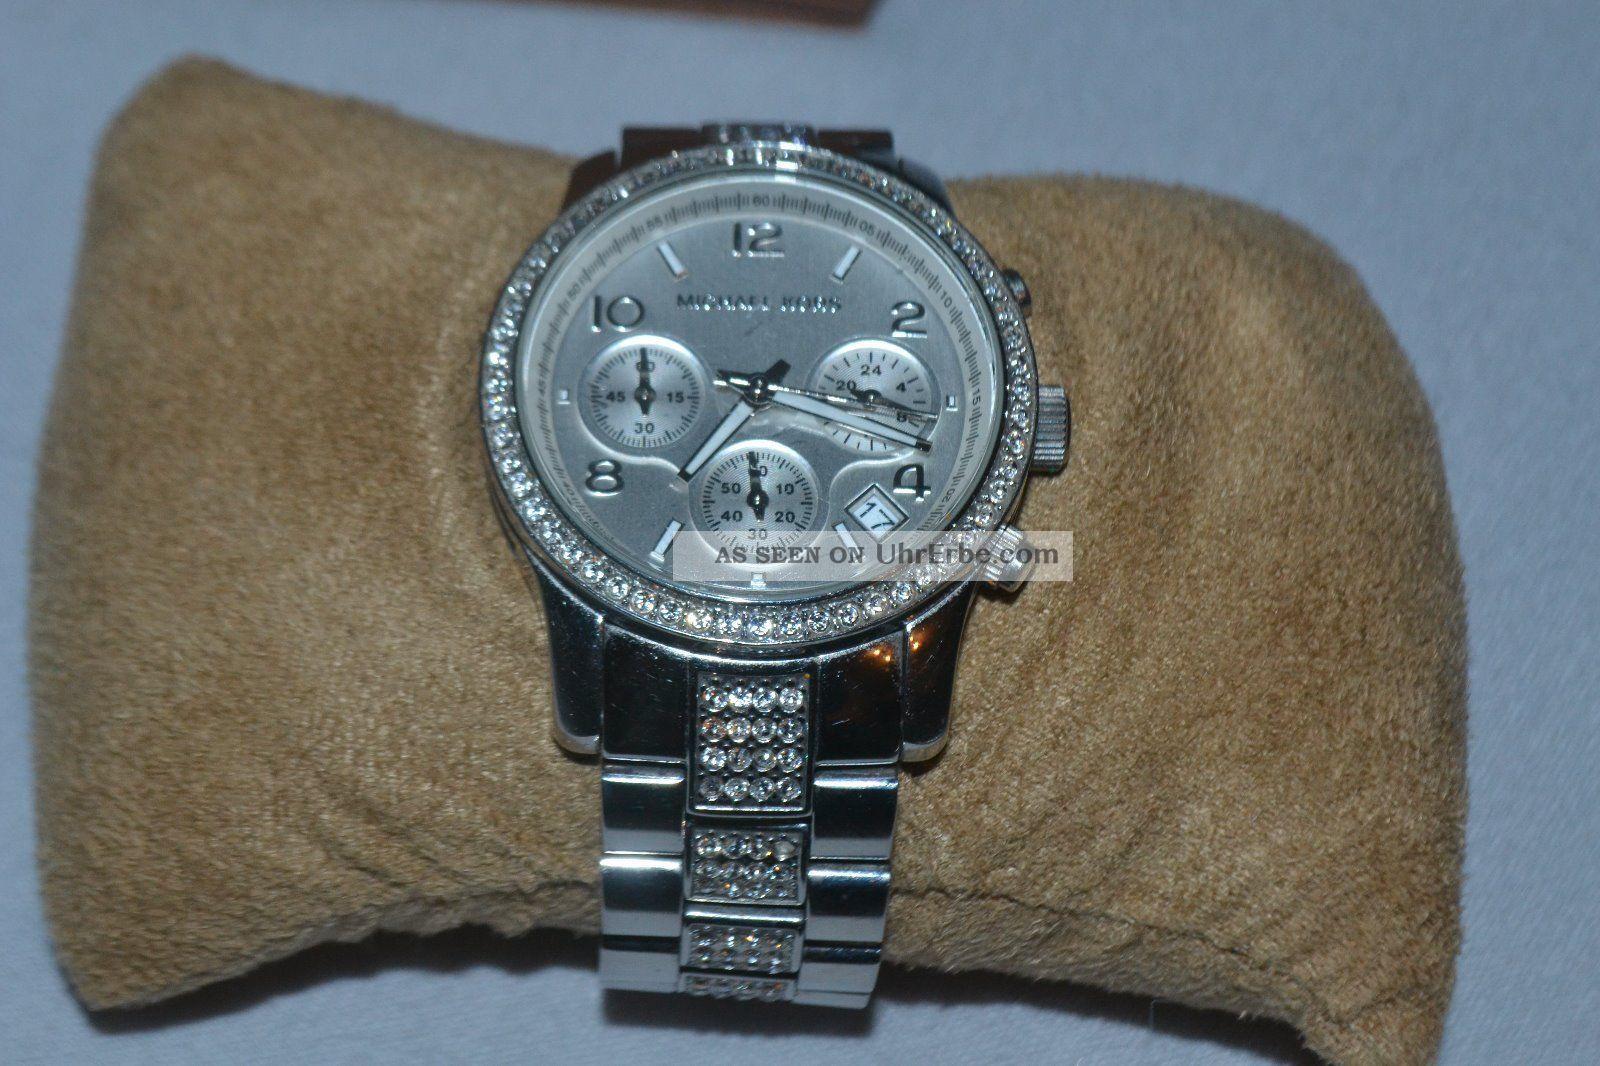 Michael Kors Damen Chronograph Mk5108 Armbanduhren Bild